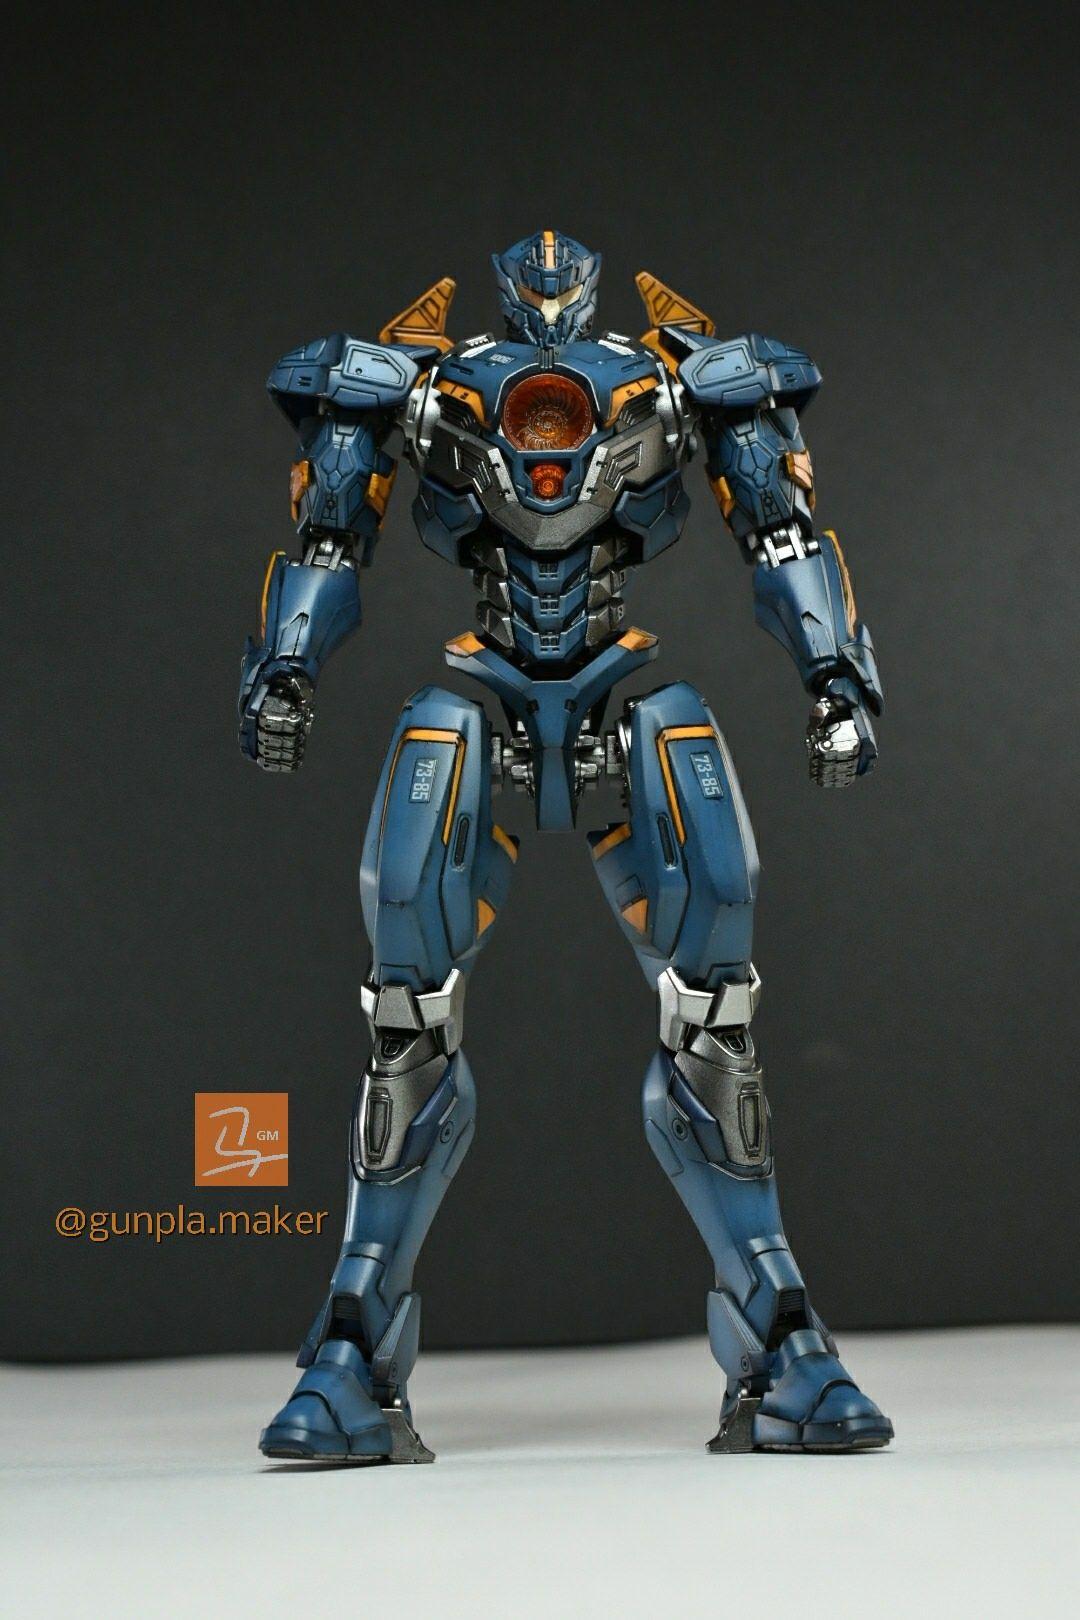 Community Spotlight Gunpla Maker Hg Gipsy Avenger Pacific Rim Avengers Futuristic Armour